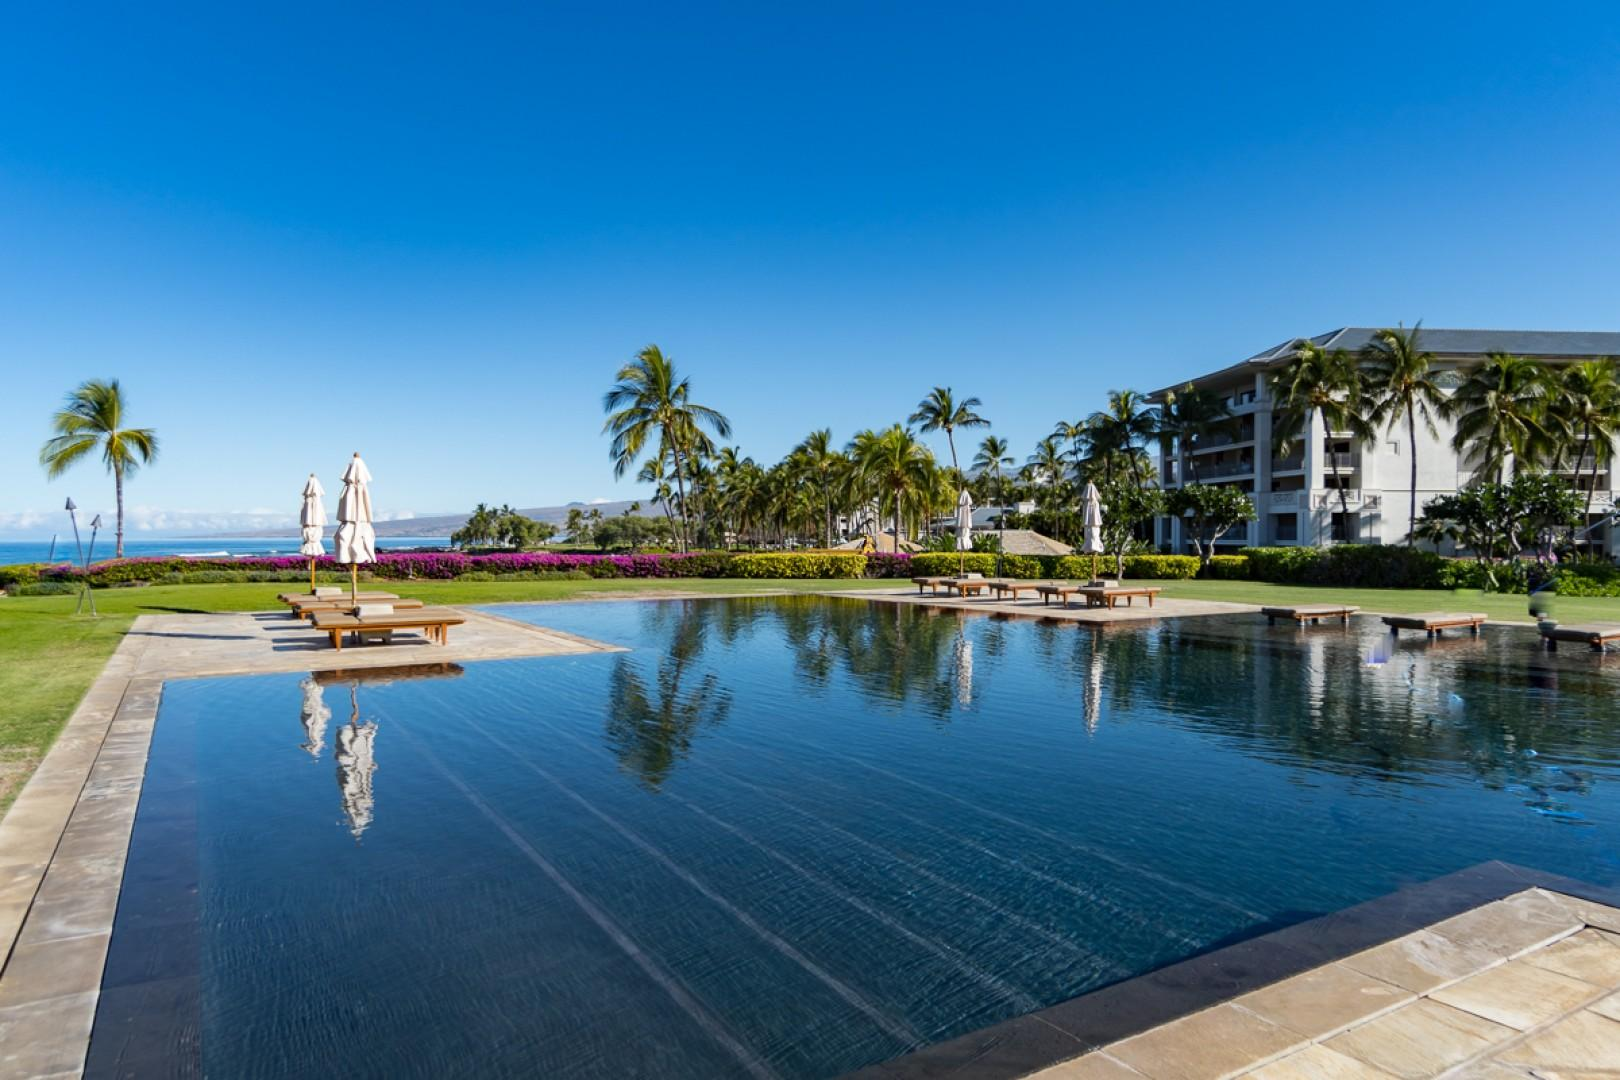 Pauoa Beach Club pool